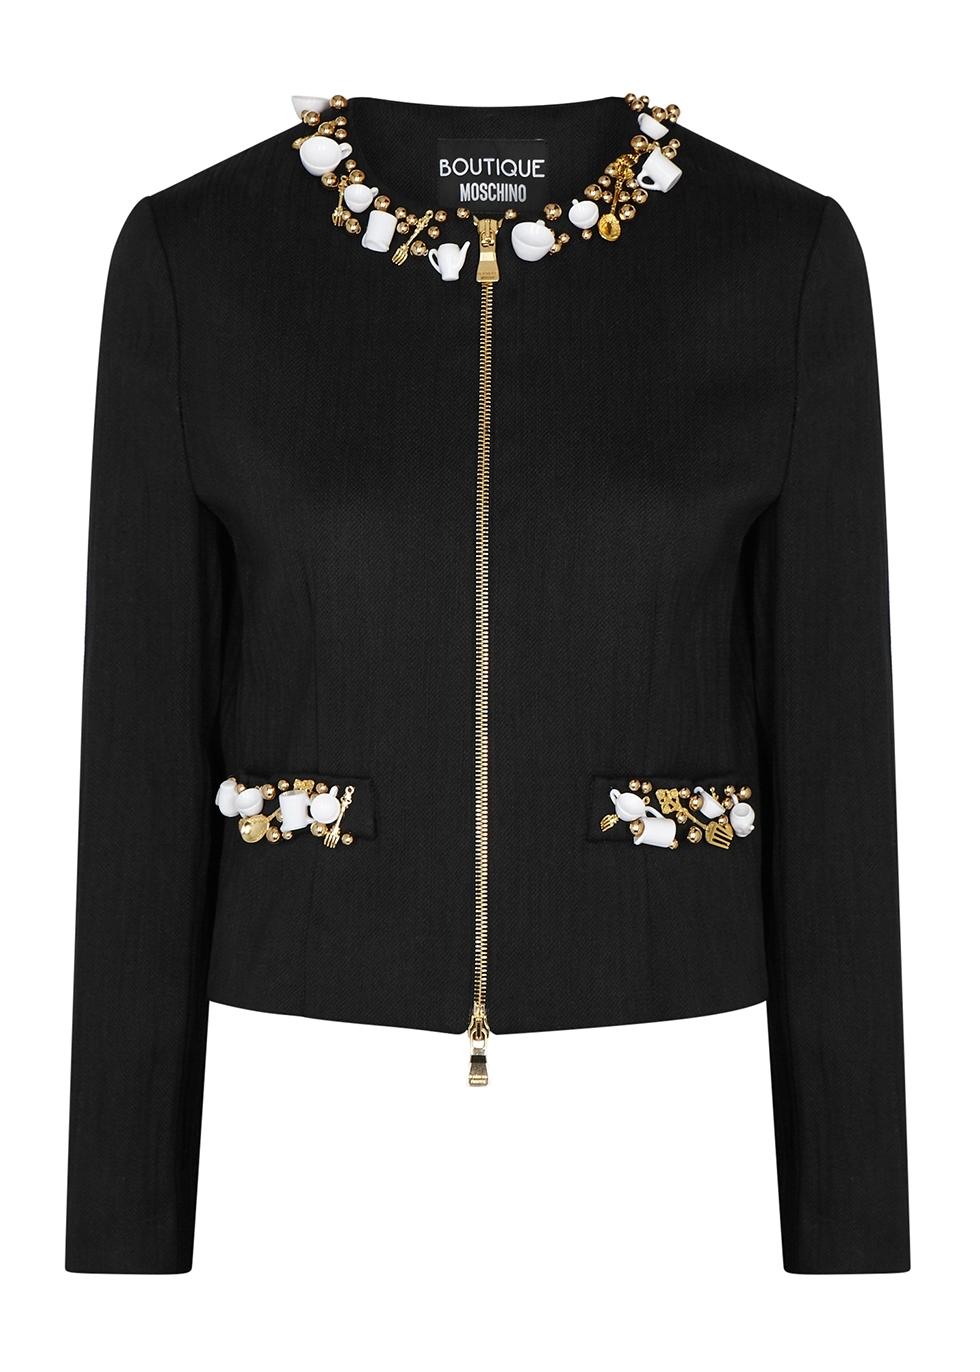 6085455ada Boutique Moschino - Italian Designer Brands - Harvey Nichols